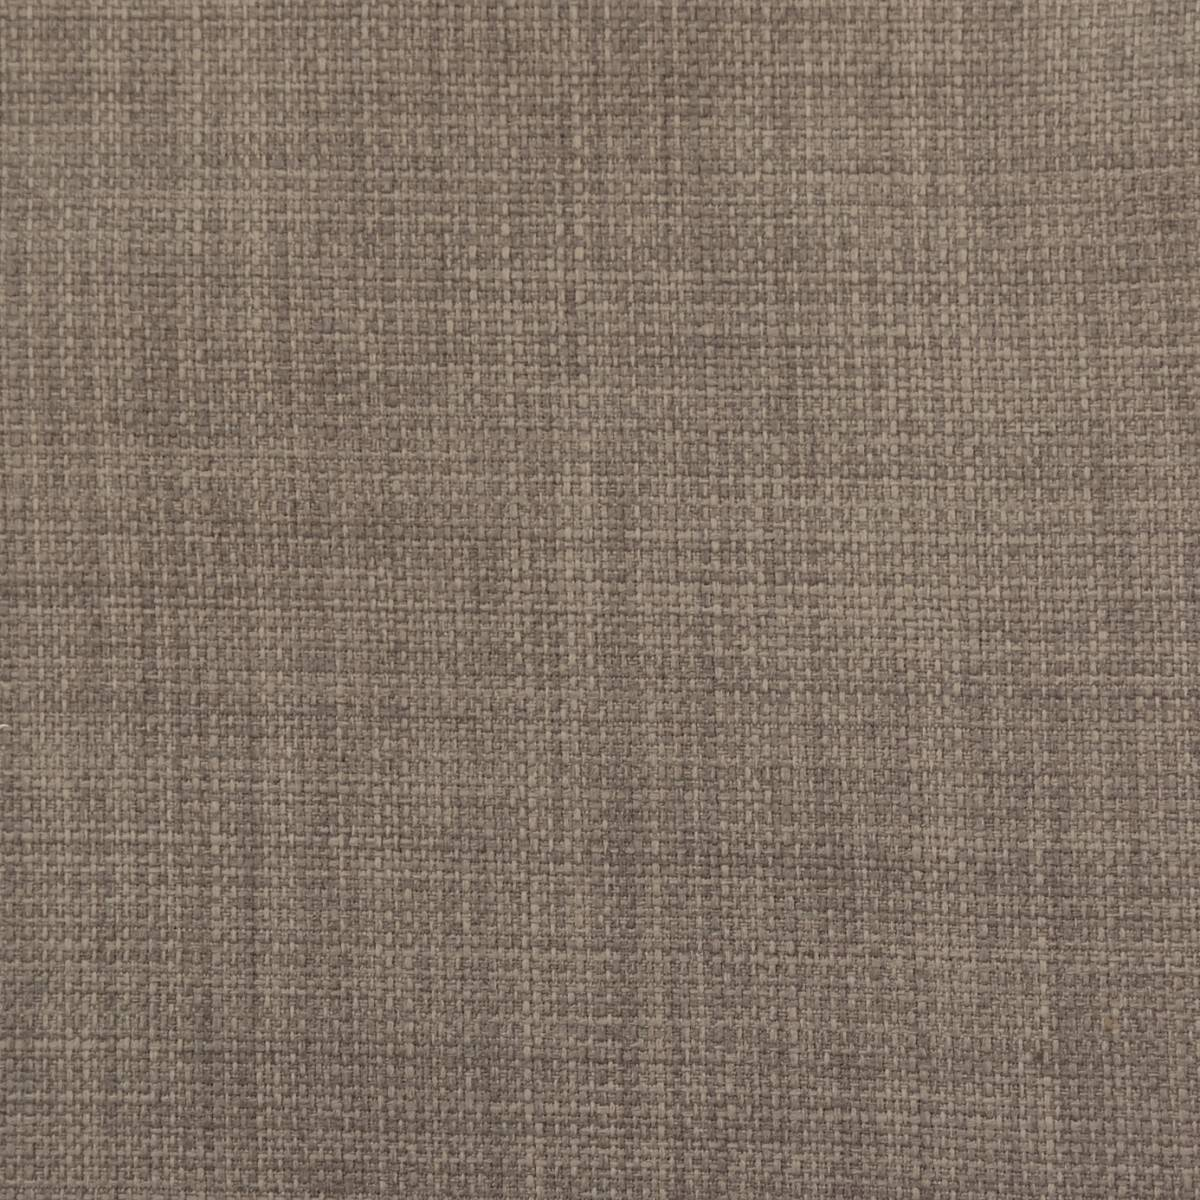 Curtains In Kendal Fabric Sparkle KENDALSPARKLE ILiv